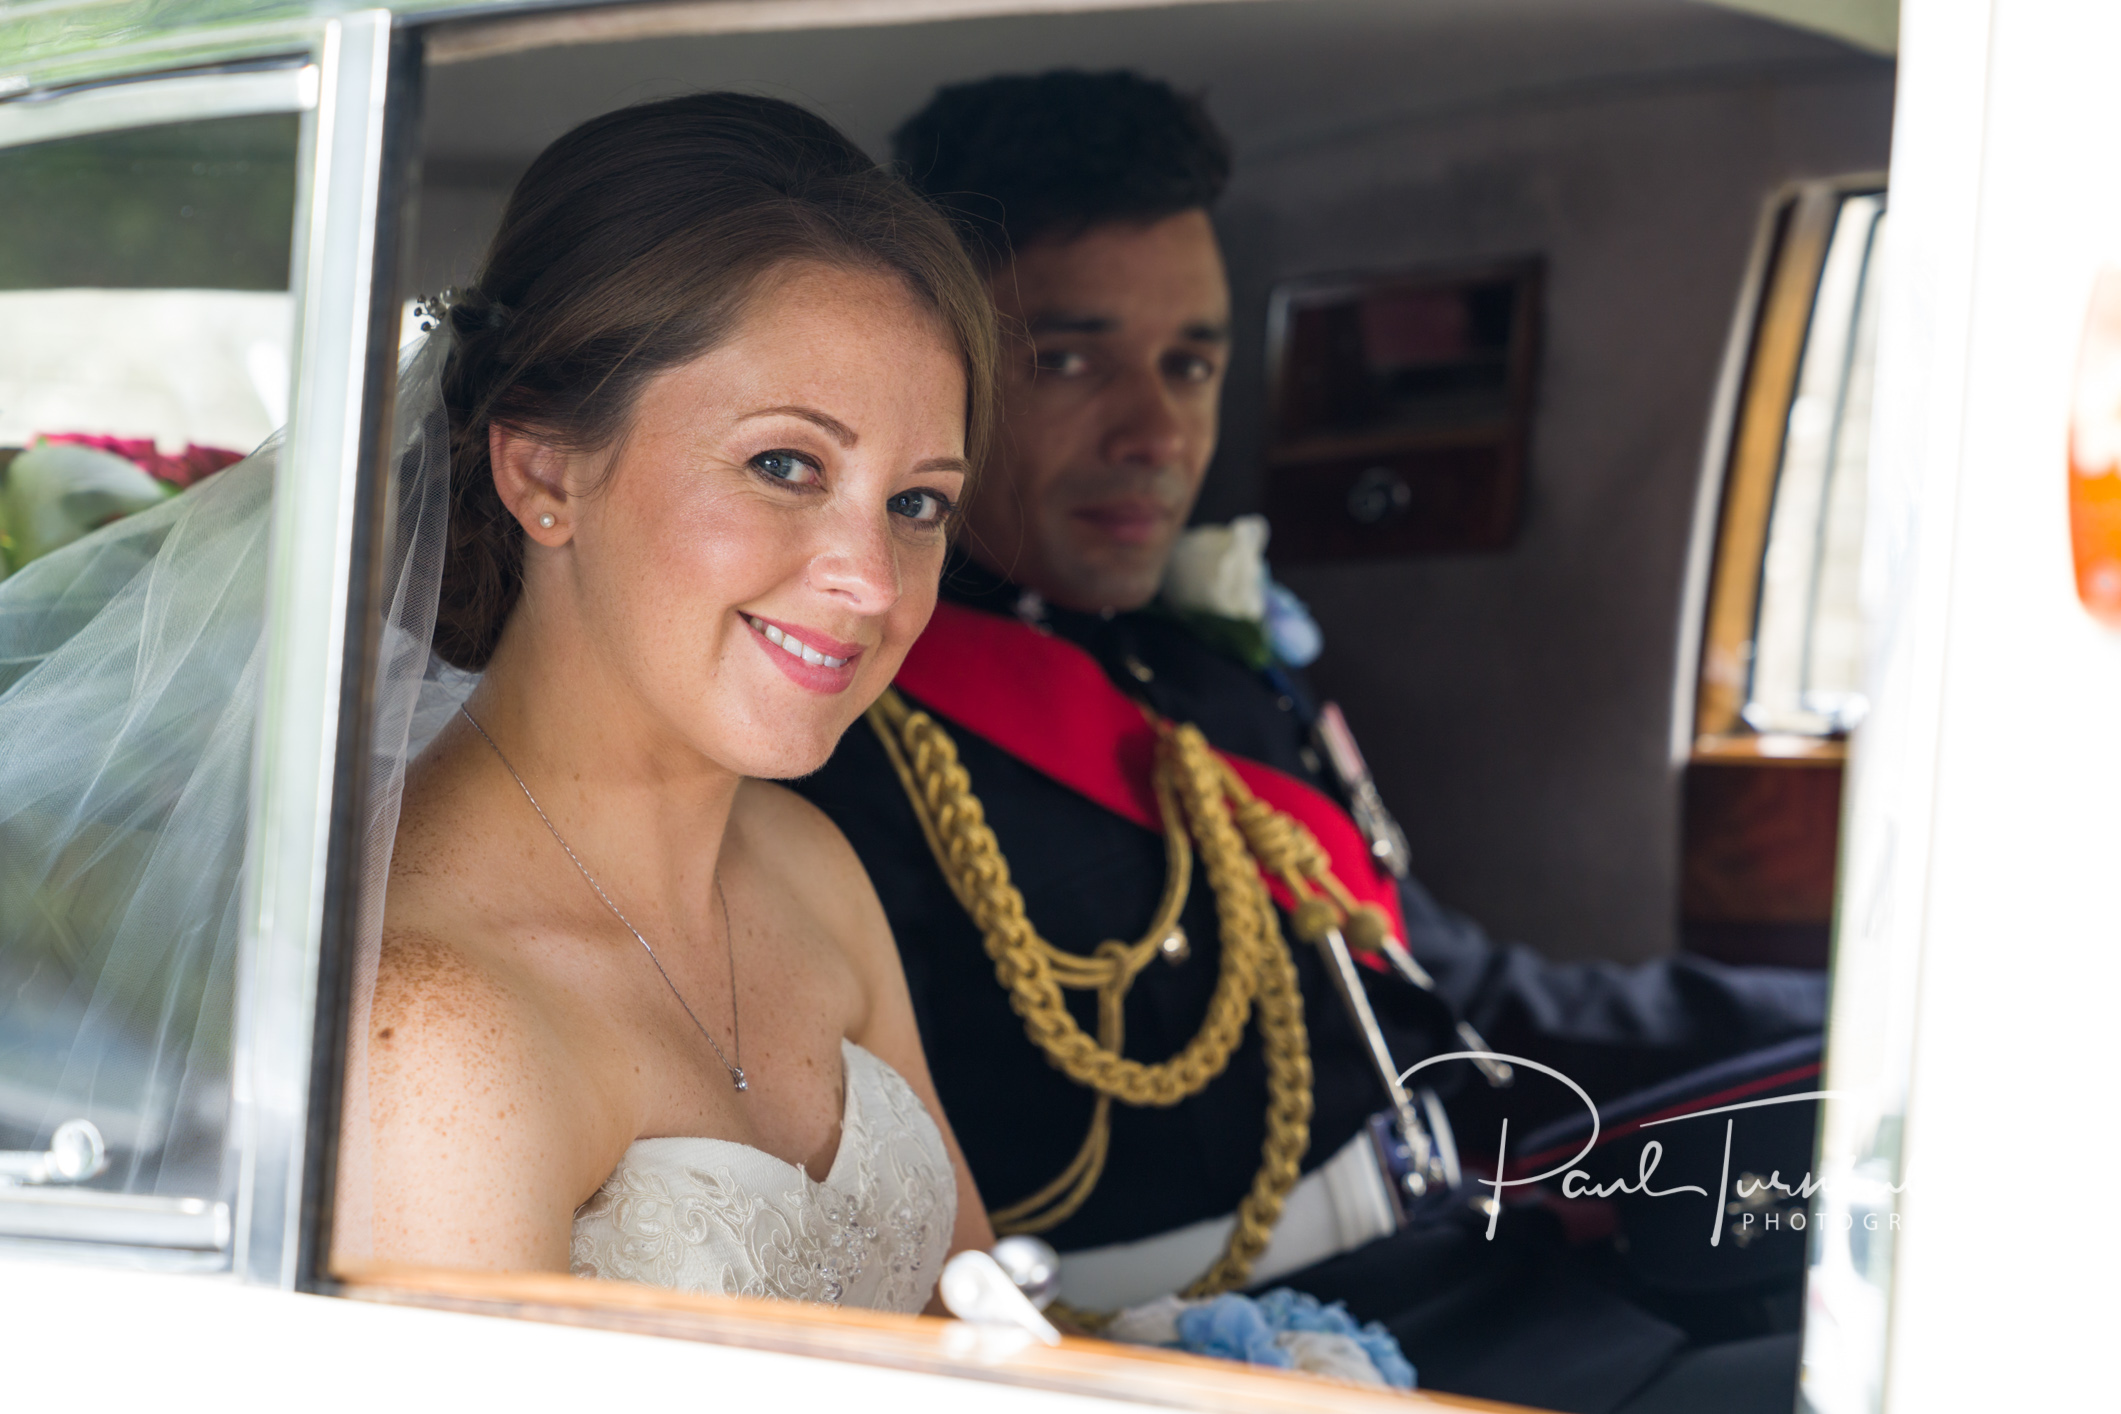 wedding-photographer-south-dalton-walkington-yorkshire-emma-james-054.jpg